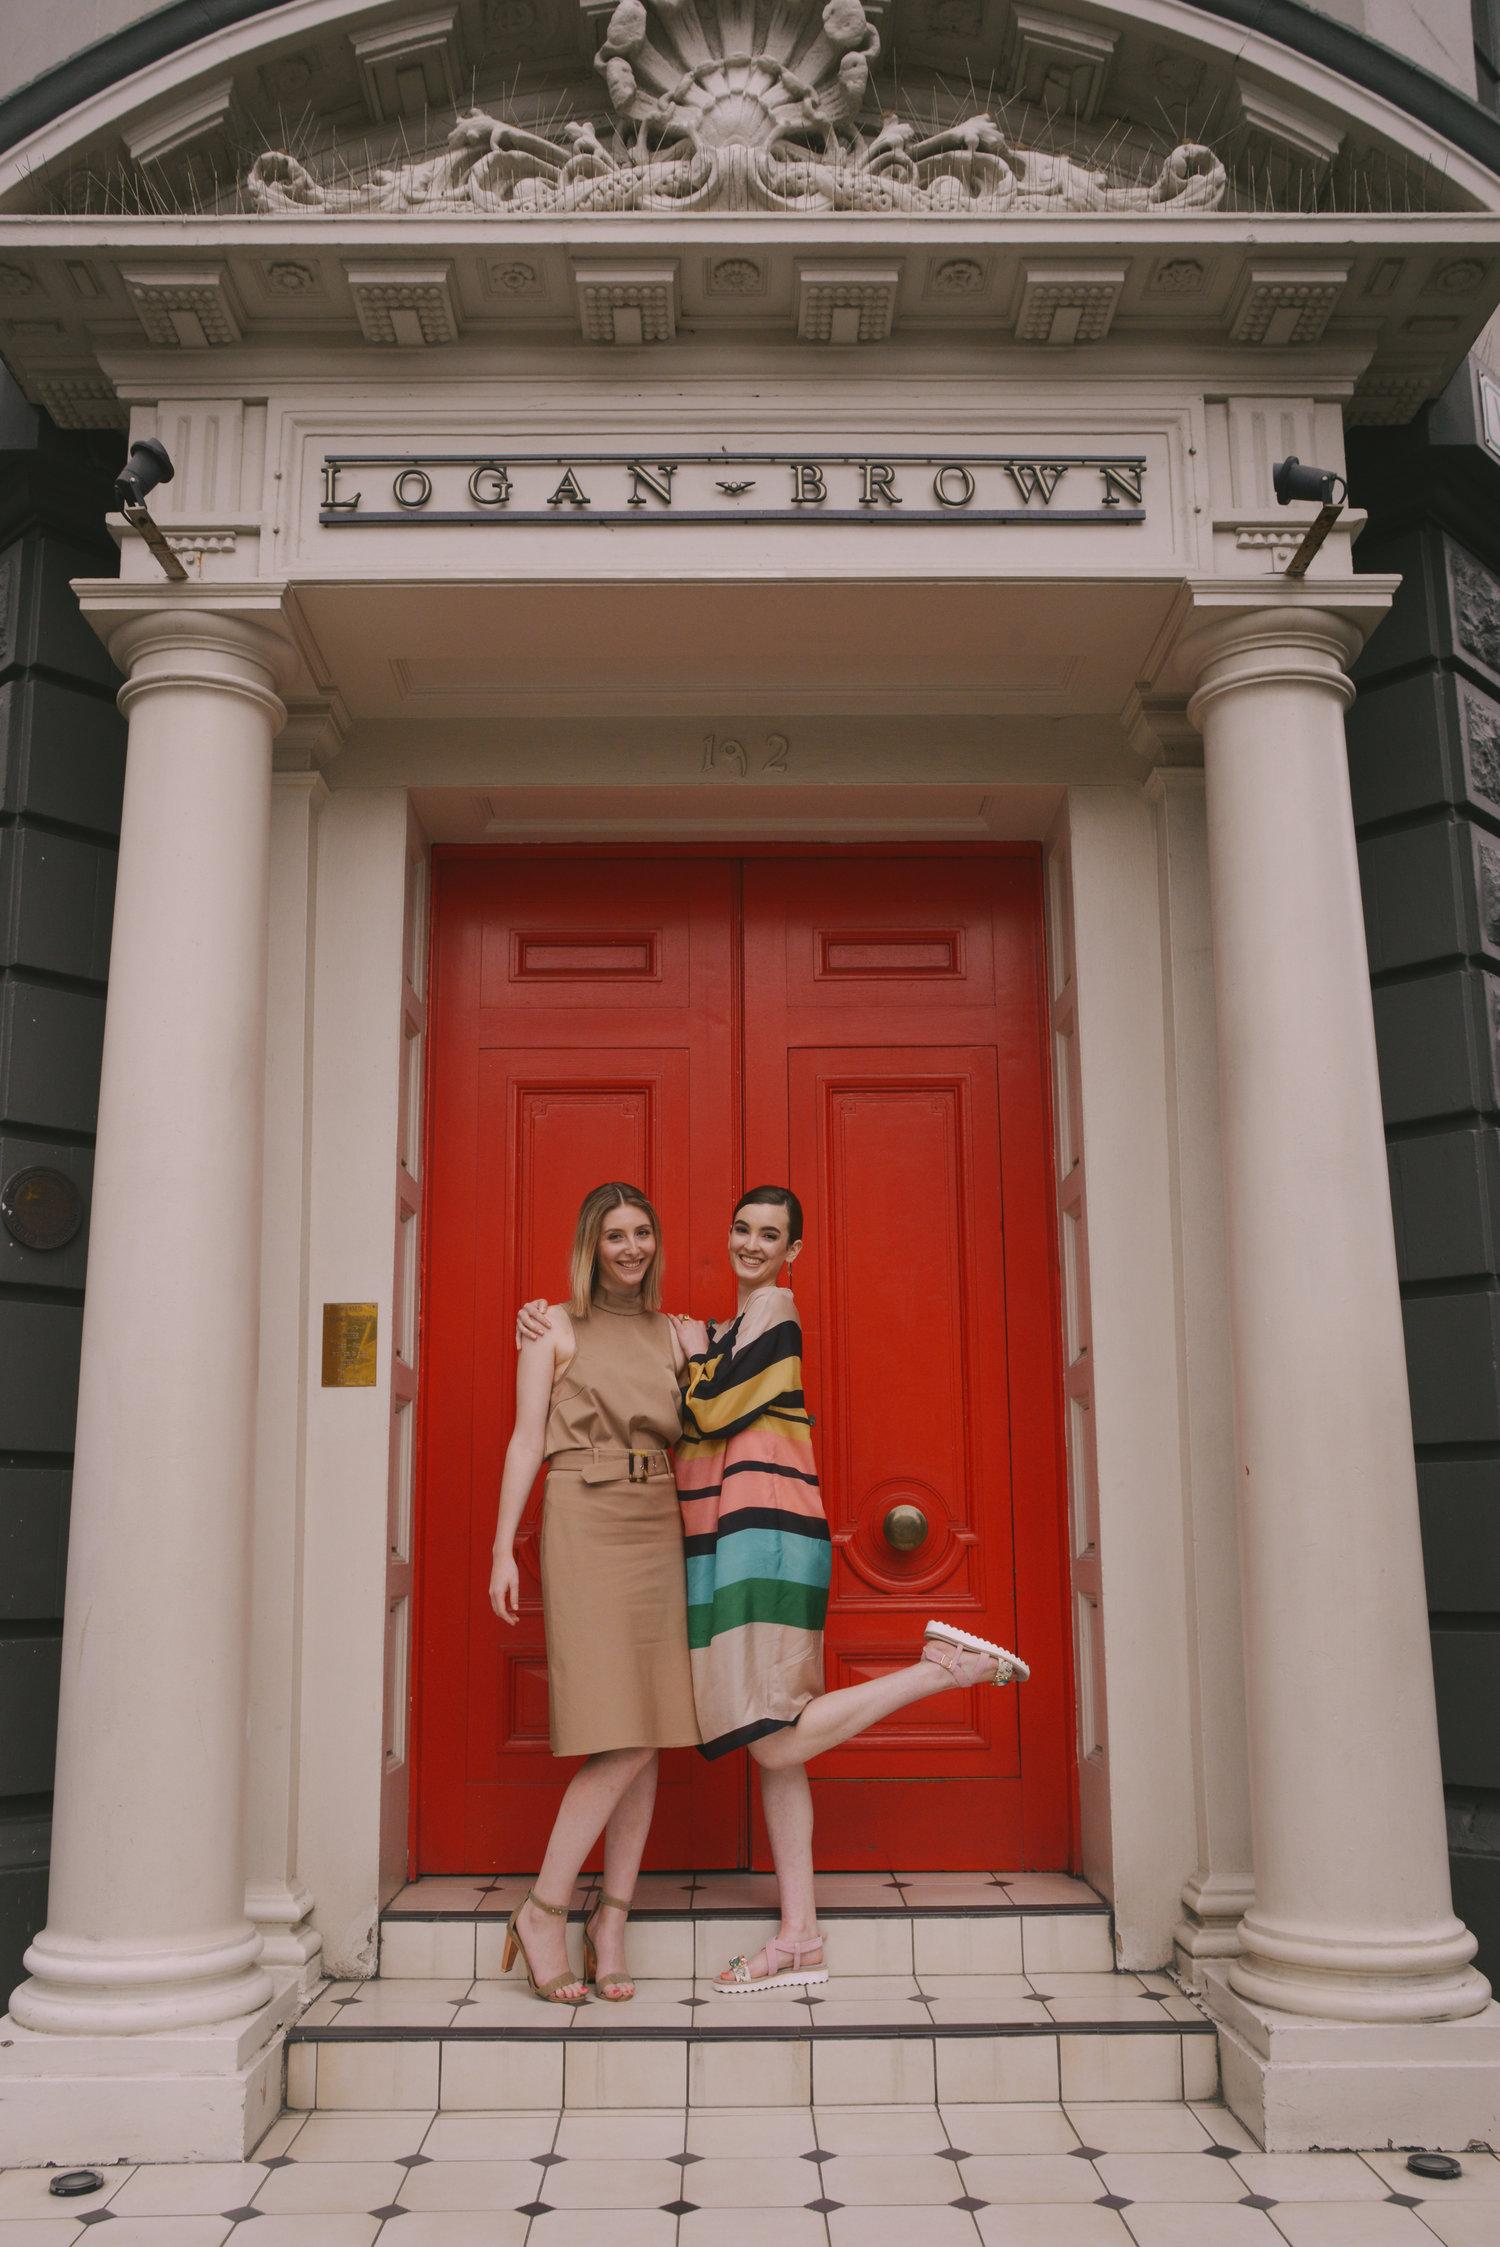 Well+Travelled+Bride+Wellington+Destination+Wedding+Guide+-+Logan+Brown.jpeg